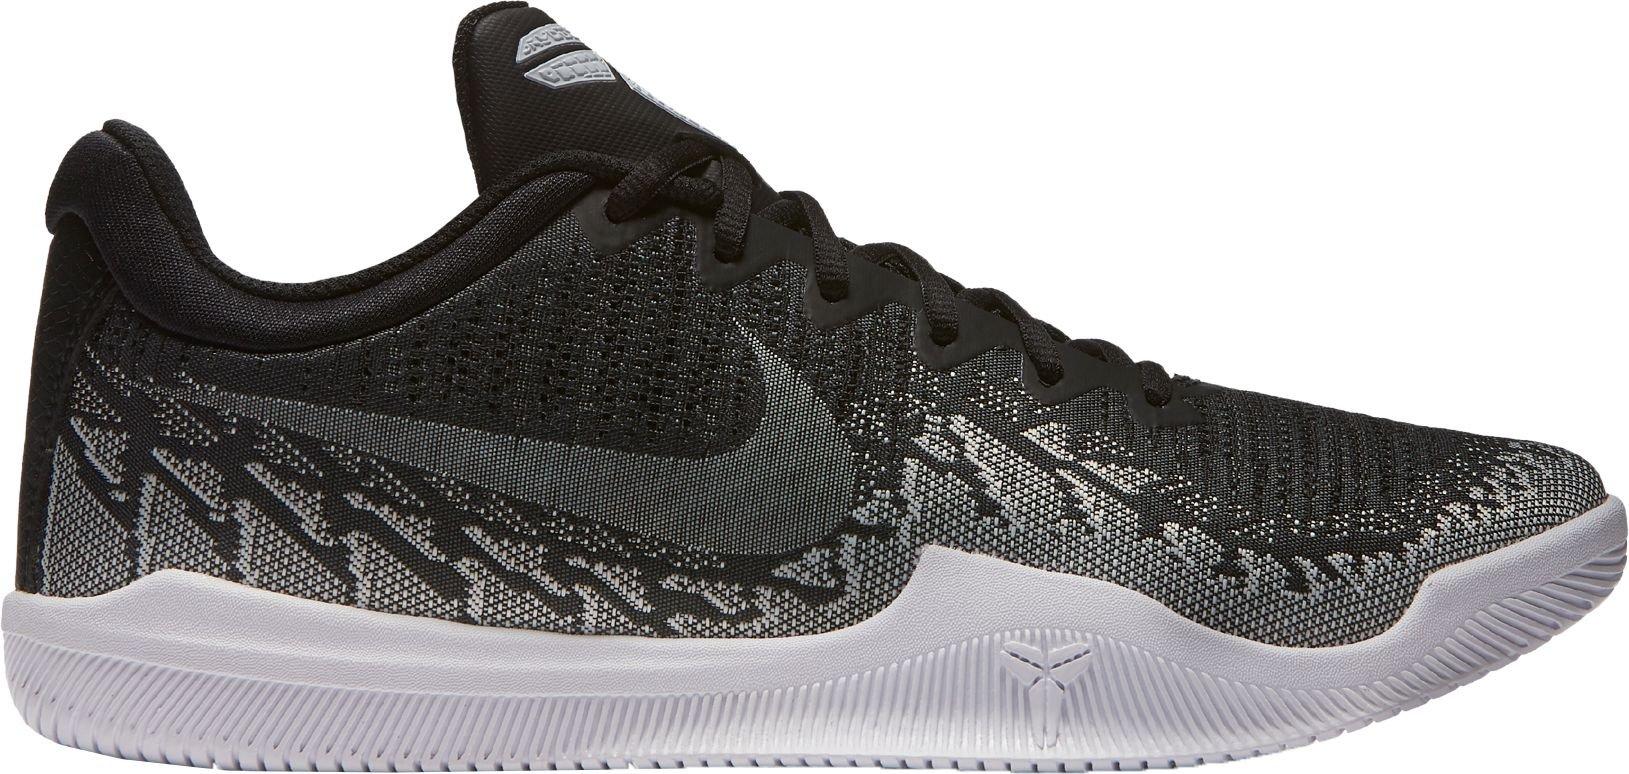 Nike Men's Mamba Rage, Anthracite/White-Black, 8 M US